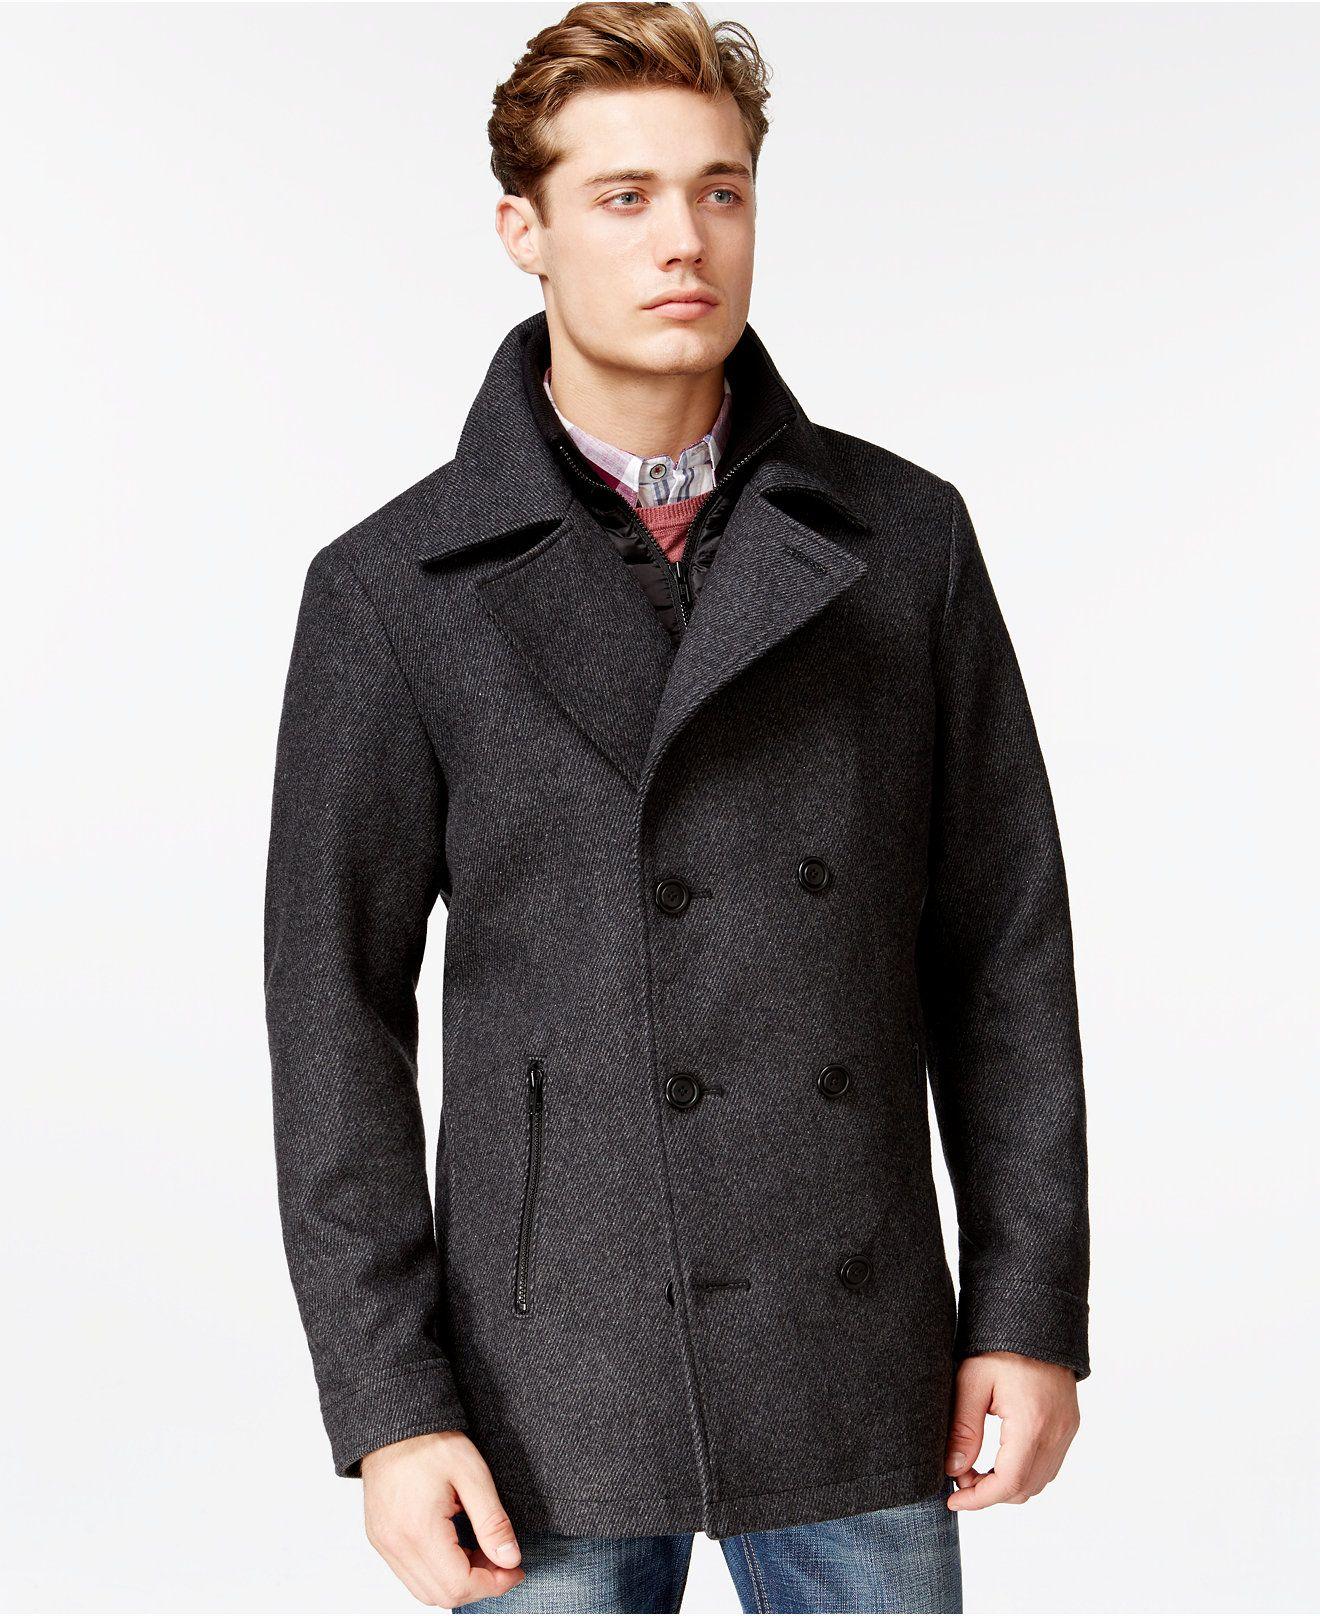 American Rag Twill Peacoat Coats Jackets Men Macy S Mens Fashion Coat Men Peacoat Outfit Peacoat [ 1616 x 1320 Pixel ]